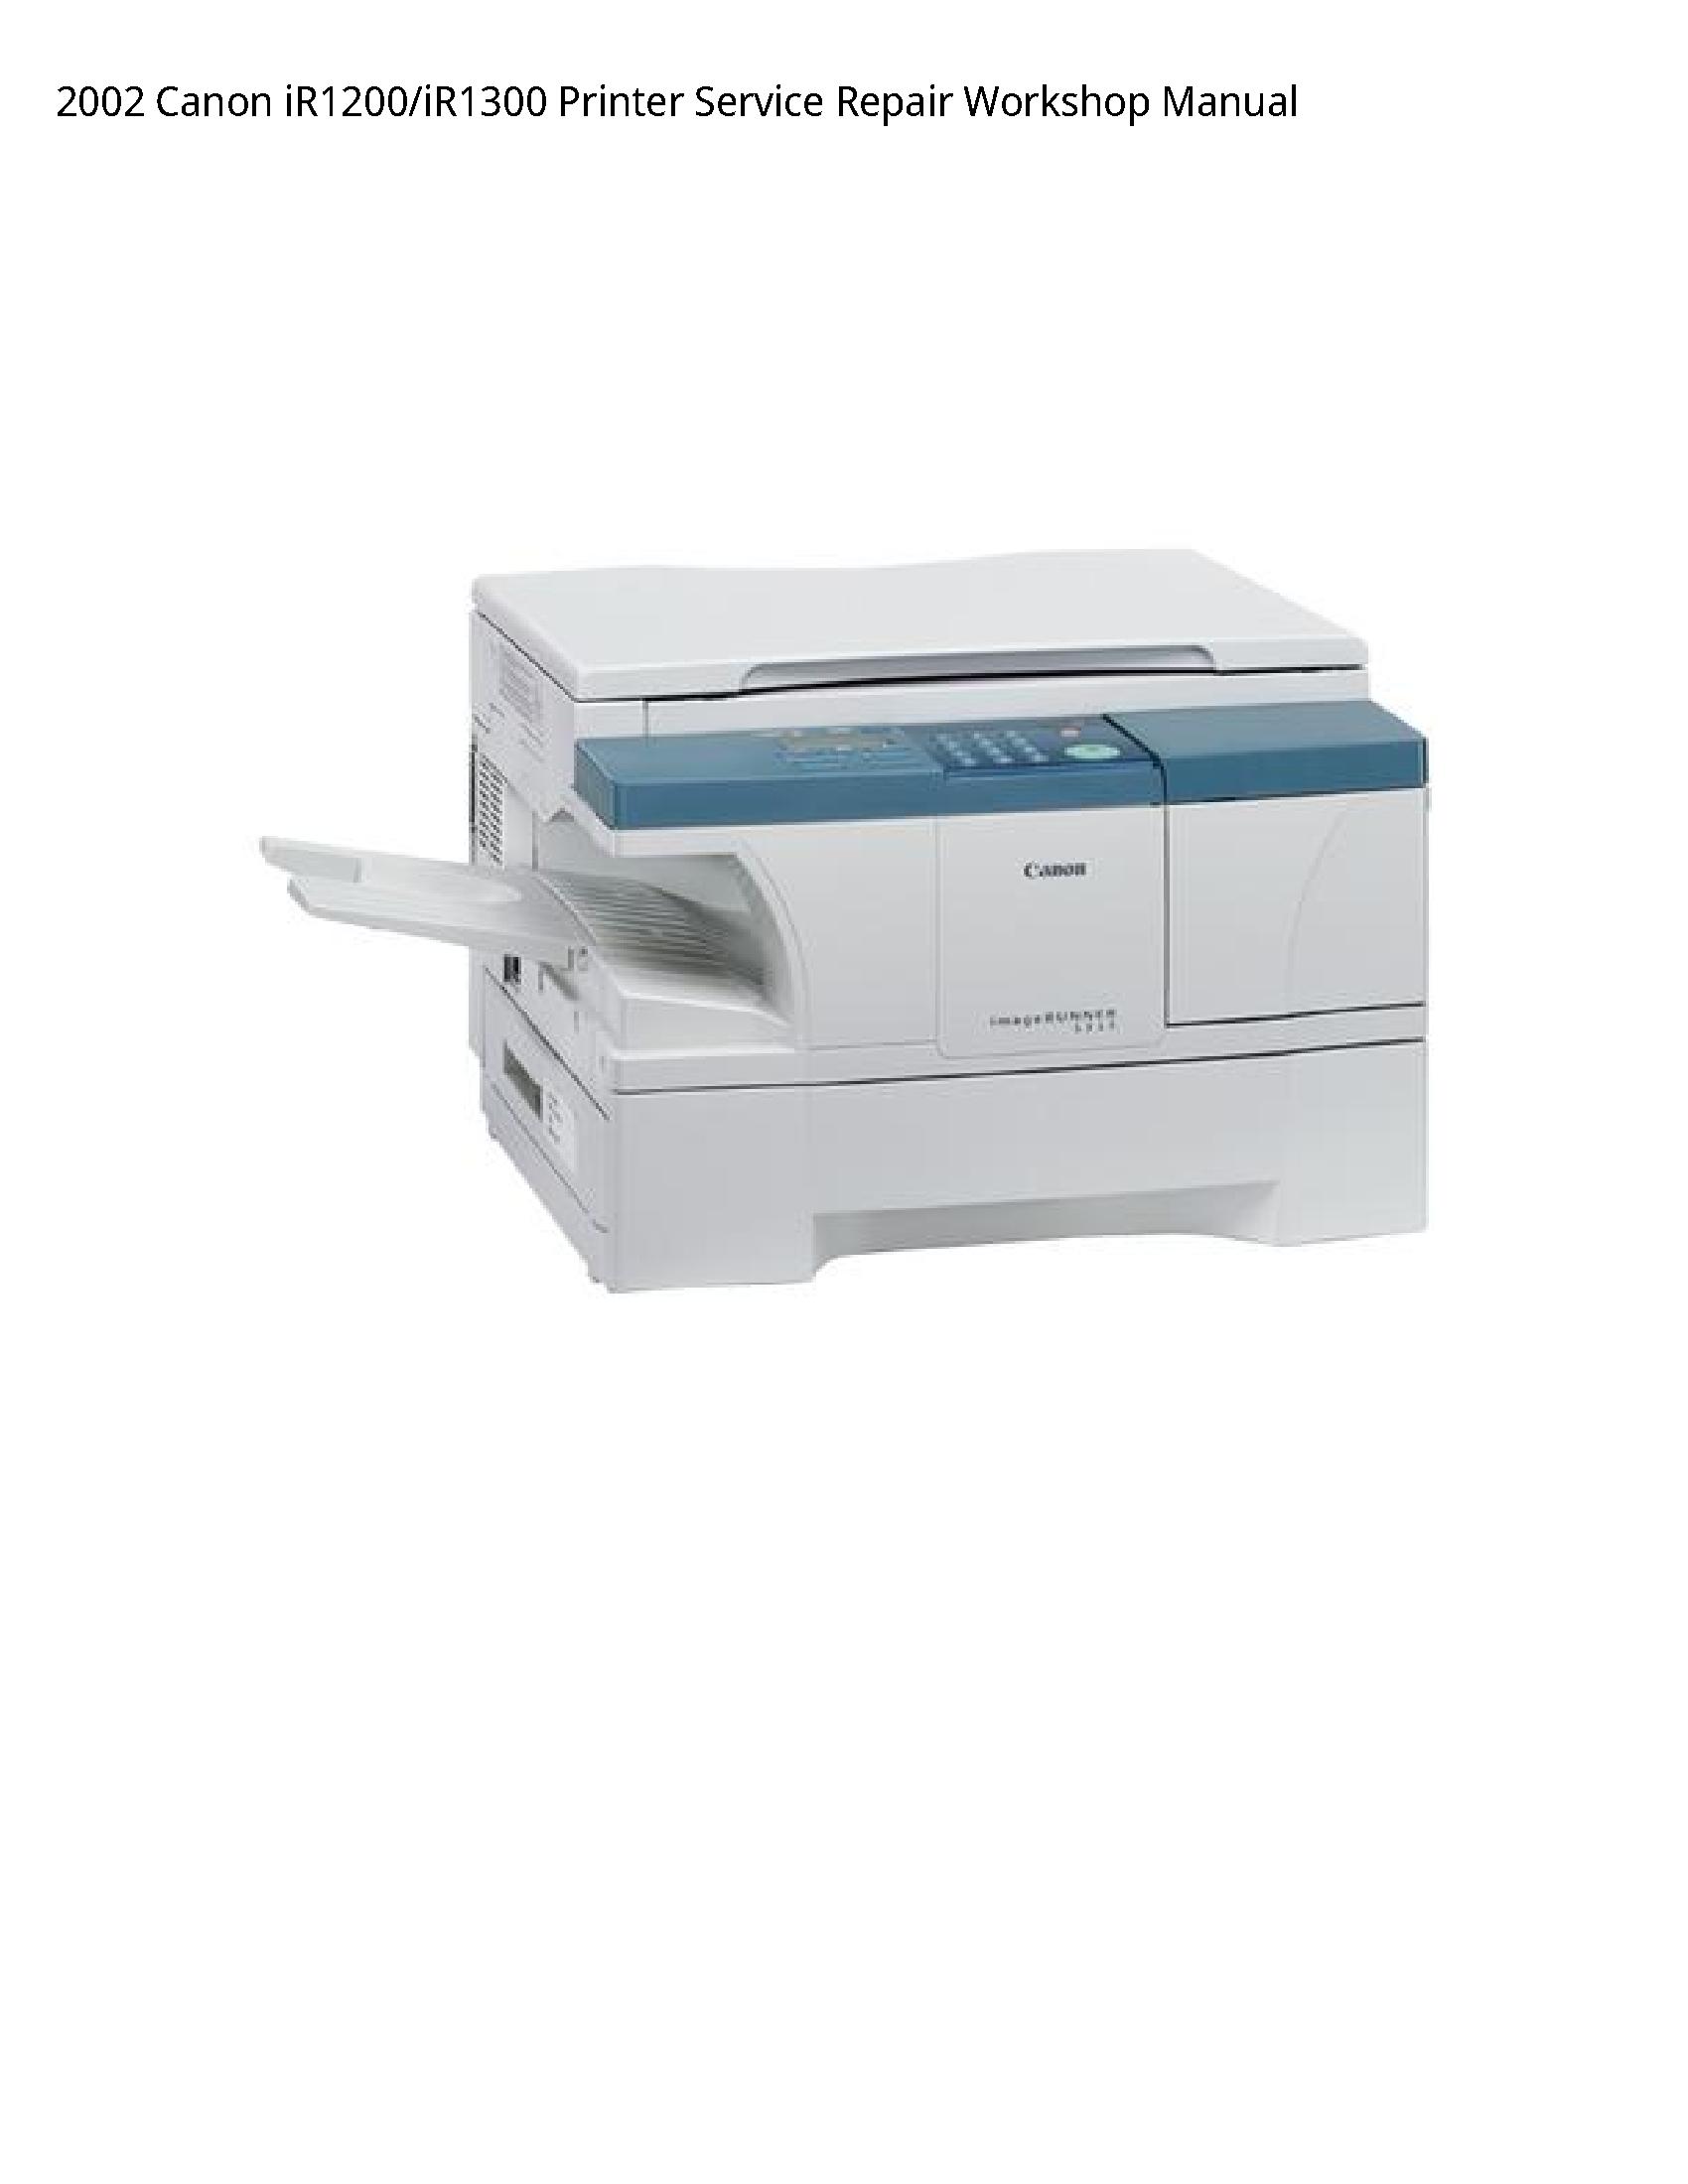 Canon iR1200 Printer manual